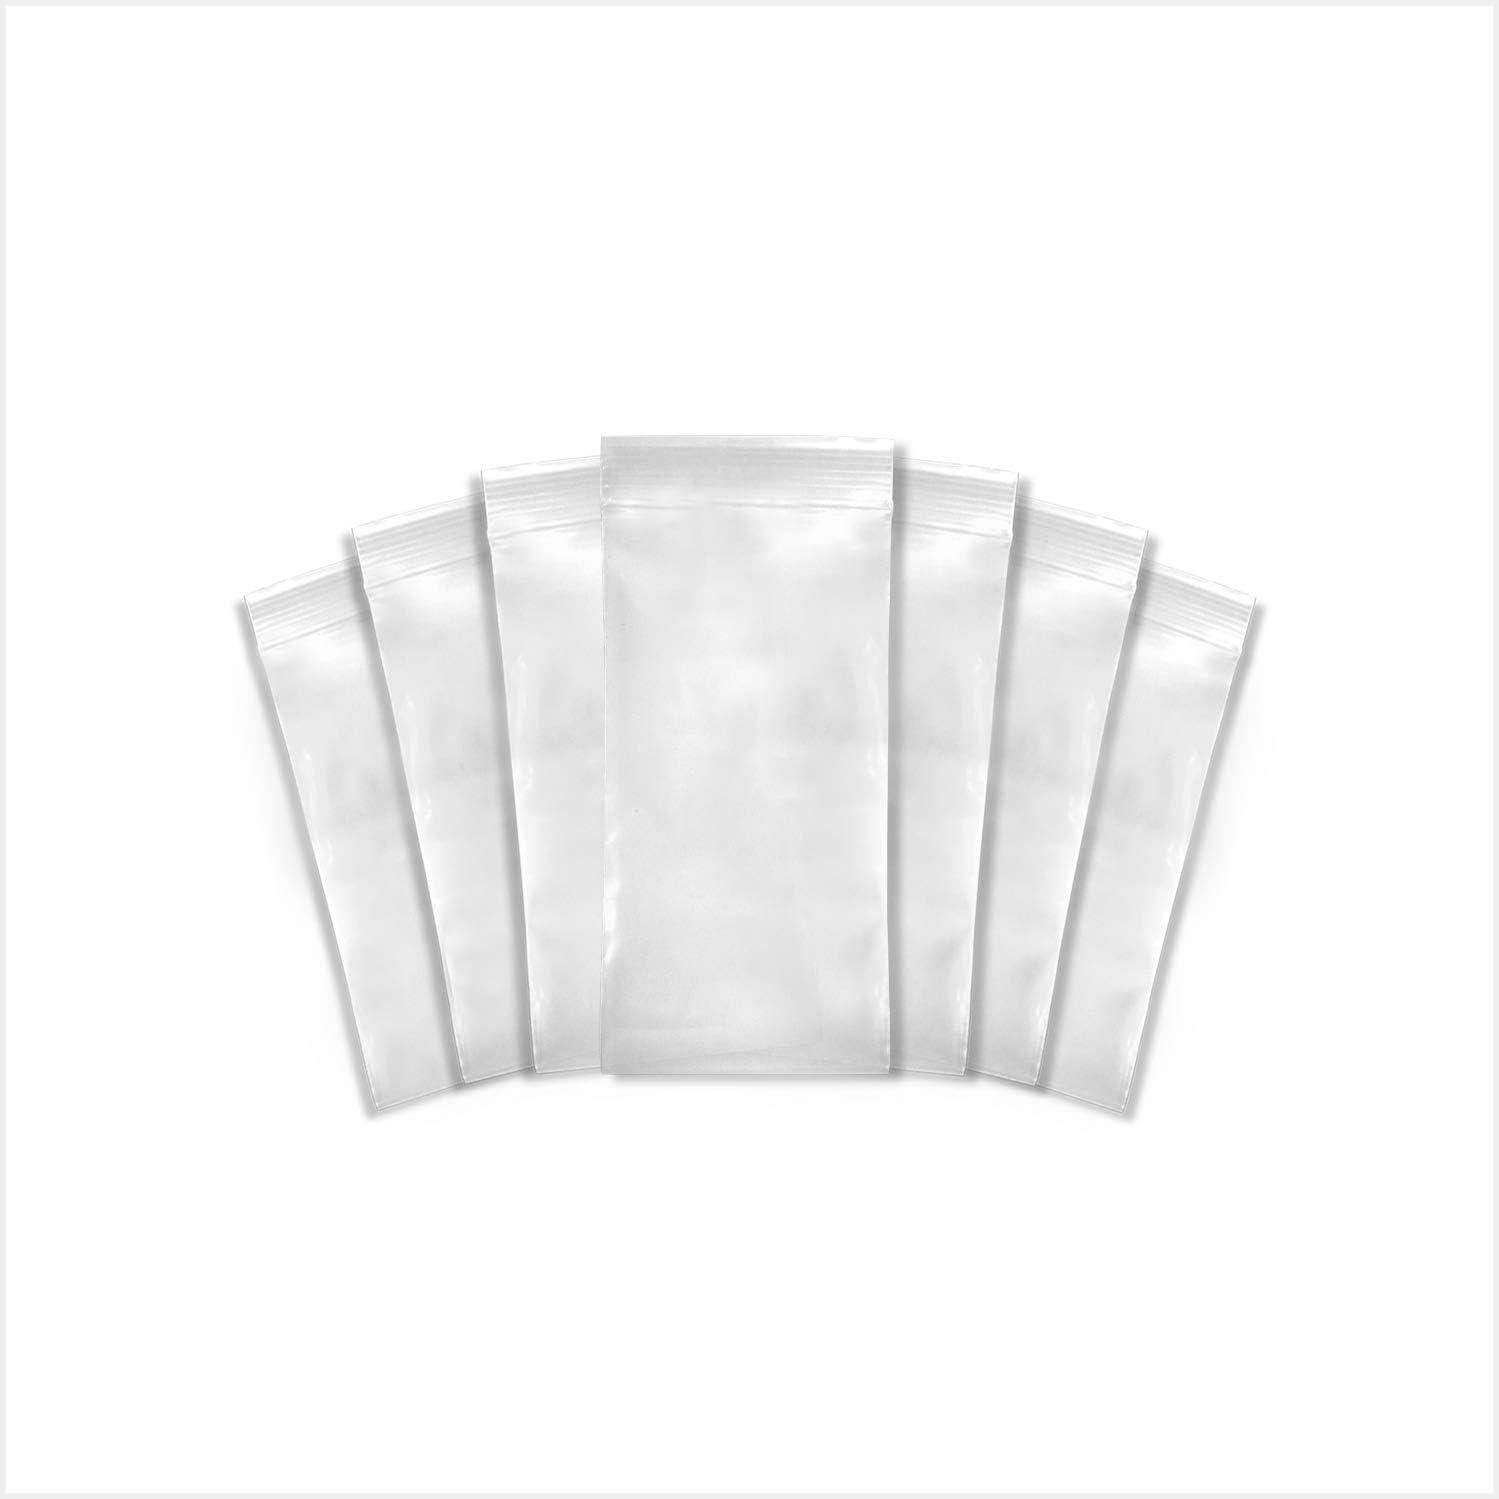 SNL Quality Zipper Lock Reclosable Clear Disposable Plastic Bags, Heavy Duty   3